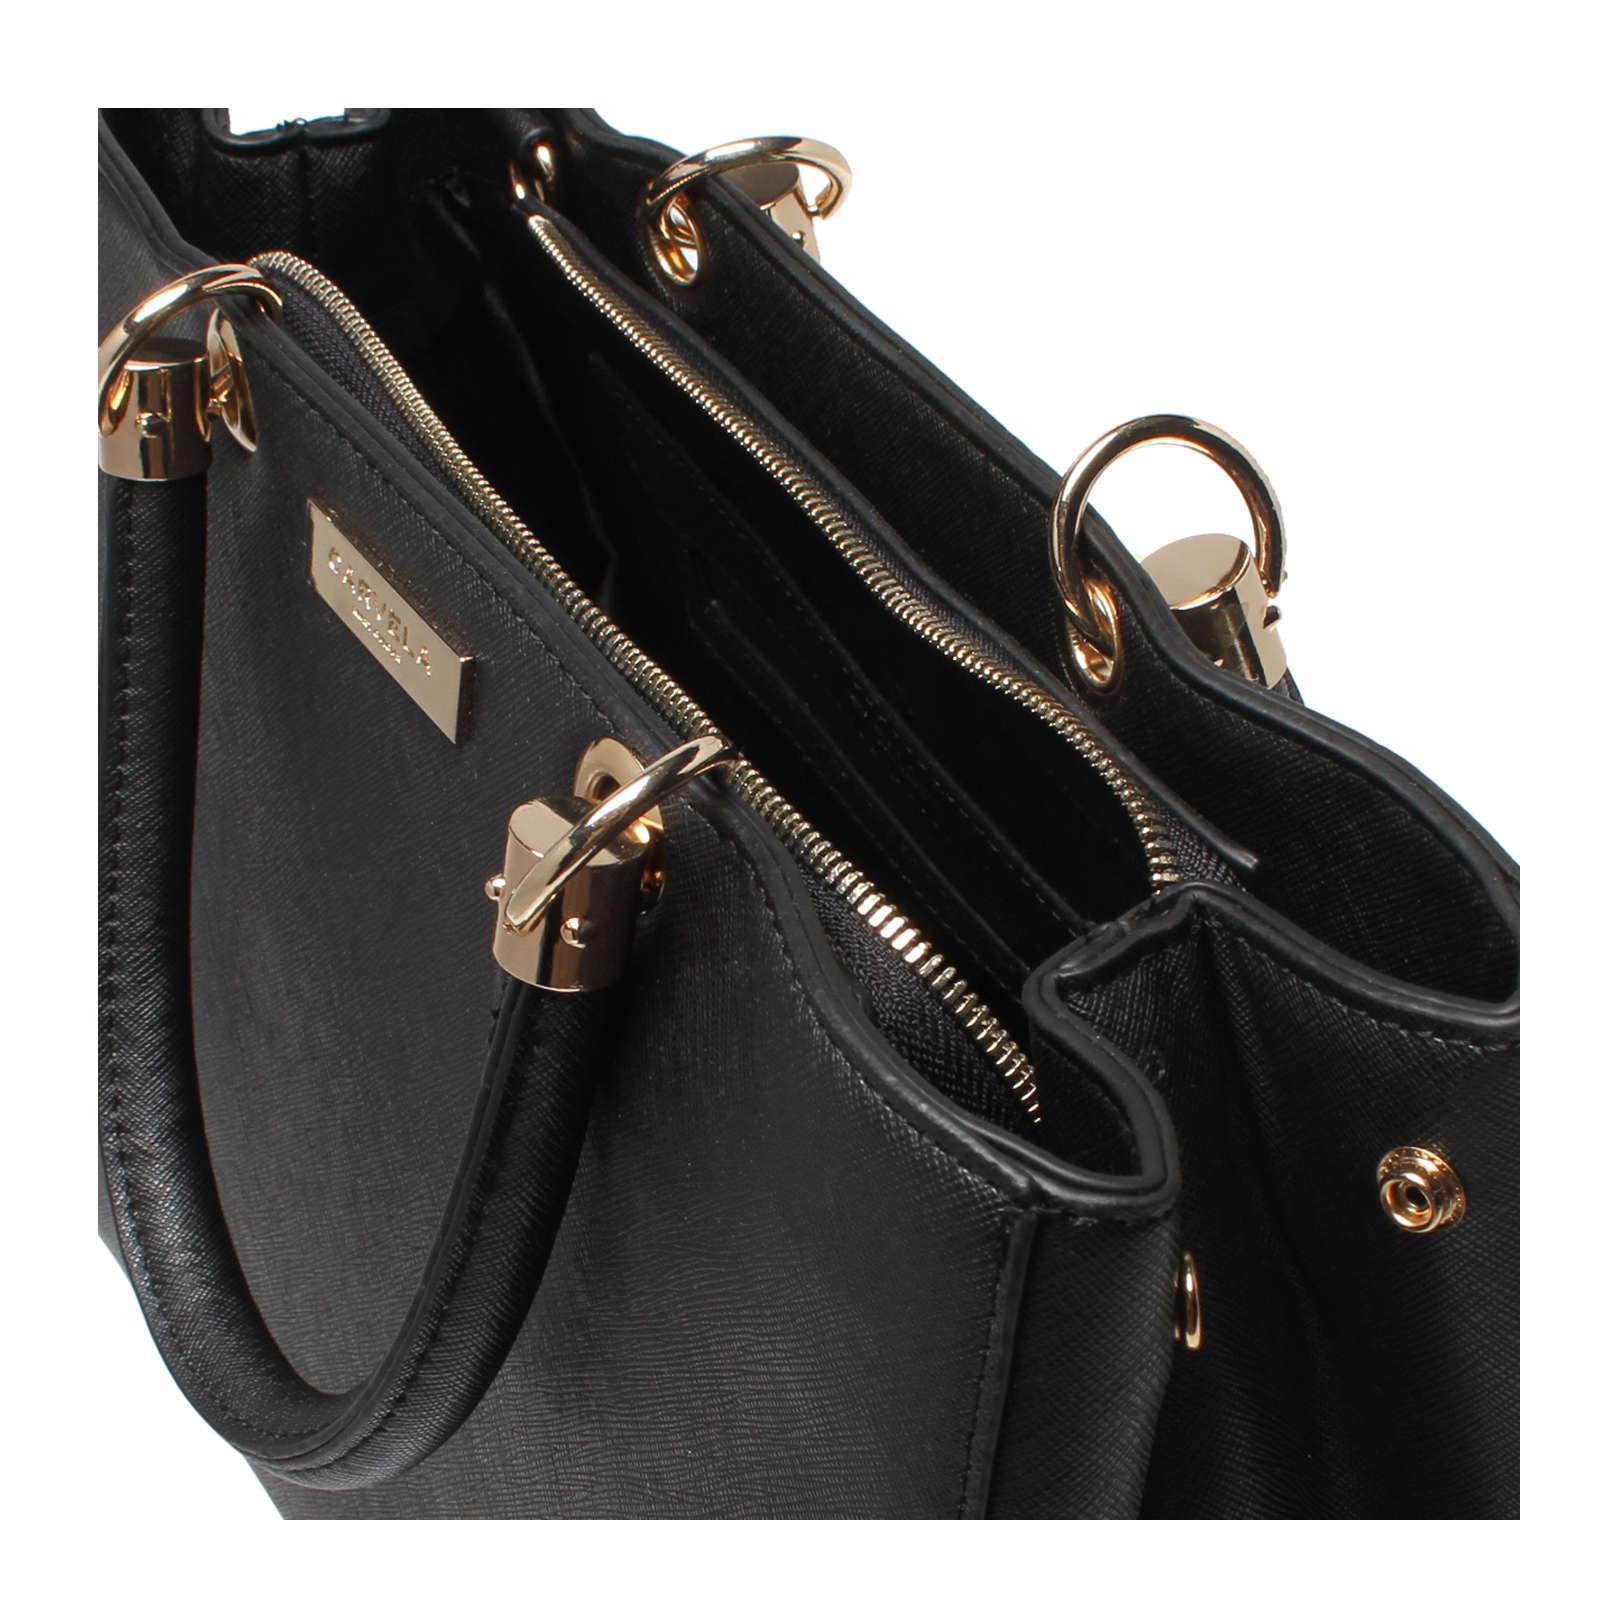 f02af17b137c DARLA STRUCTURED TOTE Carvela Darla Structured Tote Bag Black by CARVELA